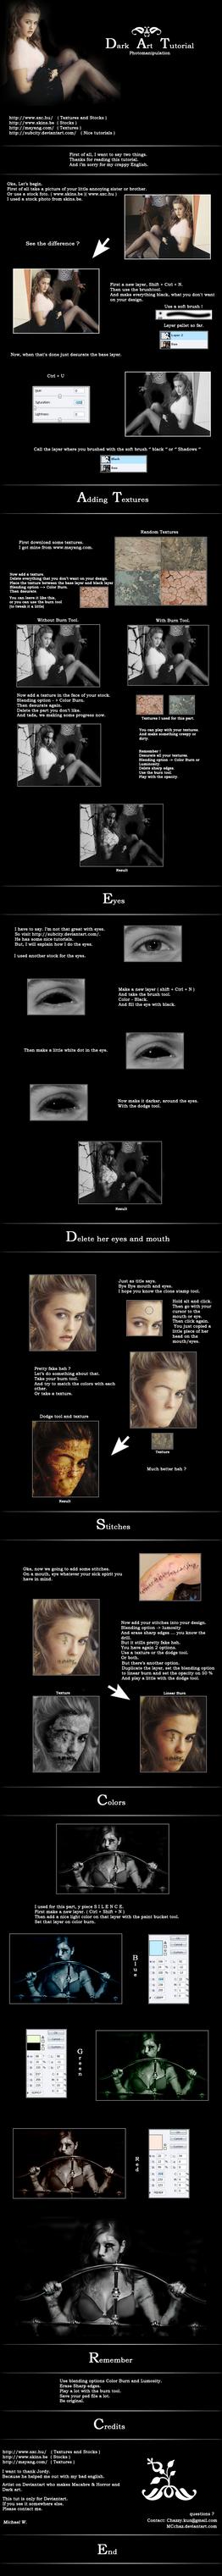 Dark art tutorial. by MCchaz